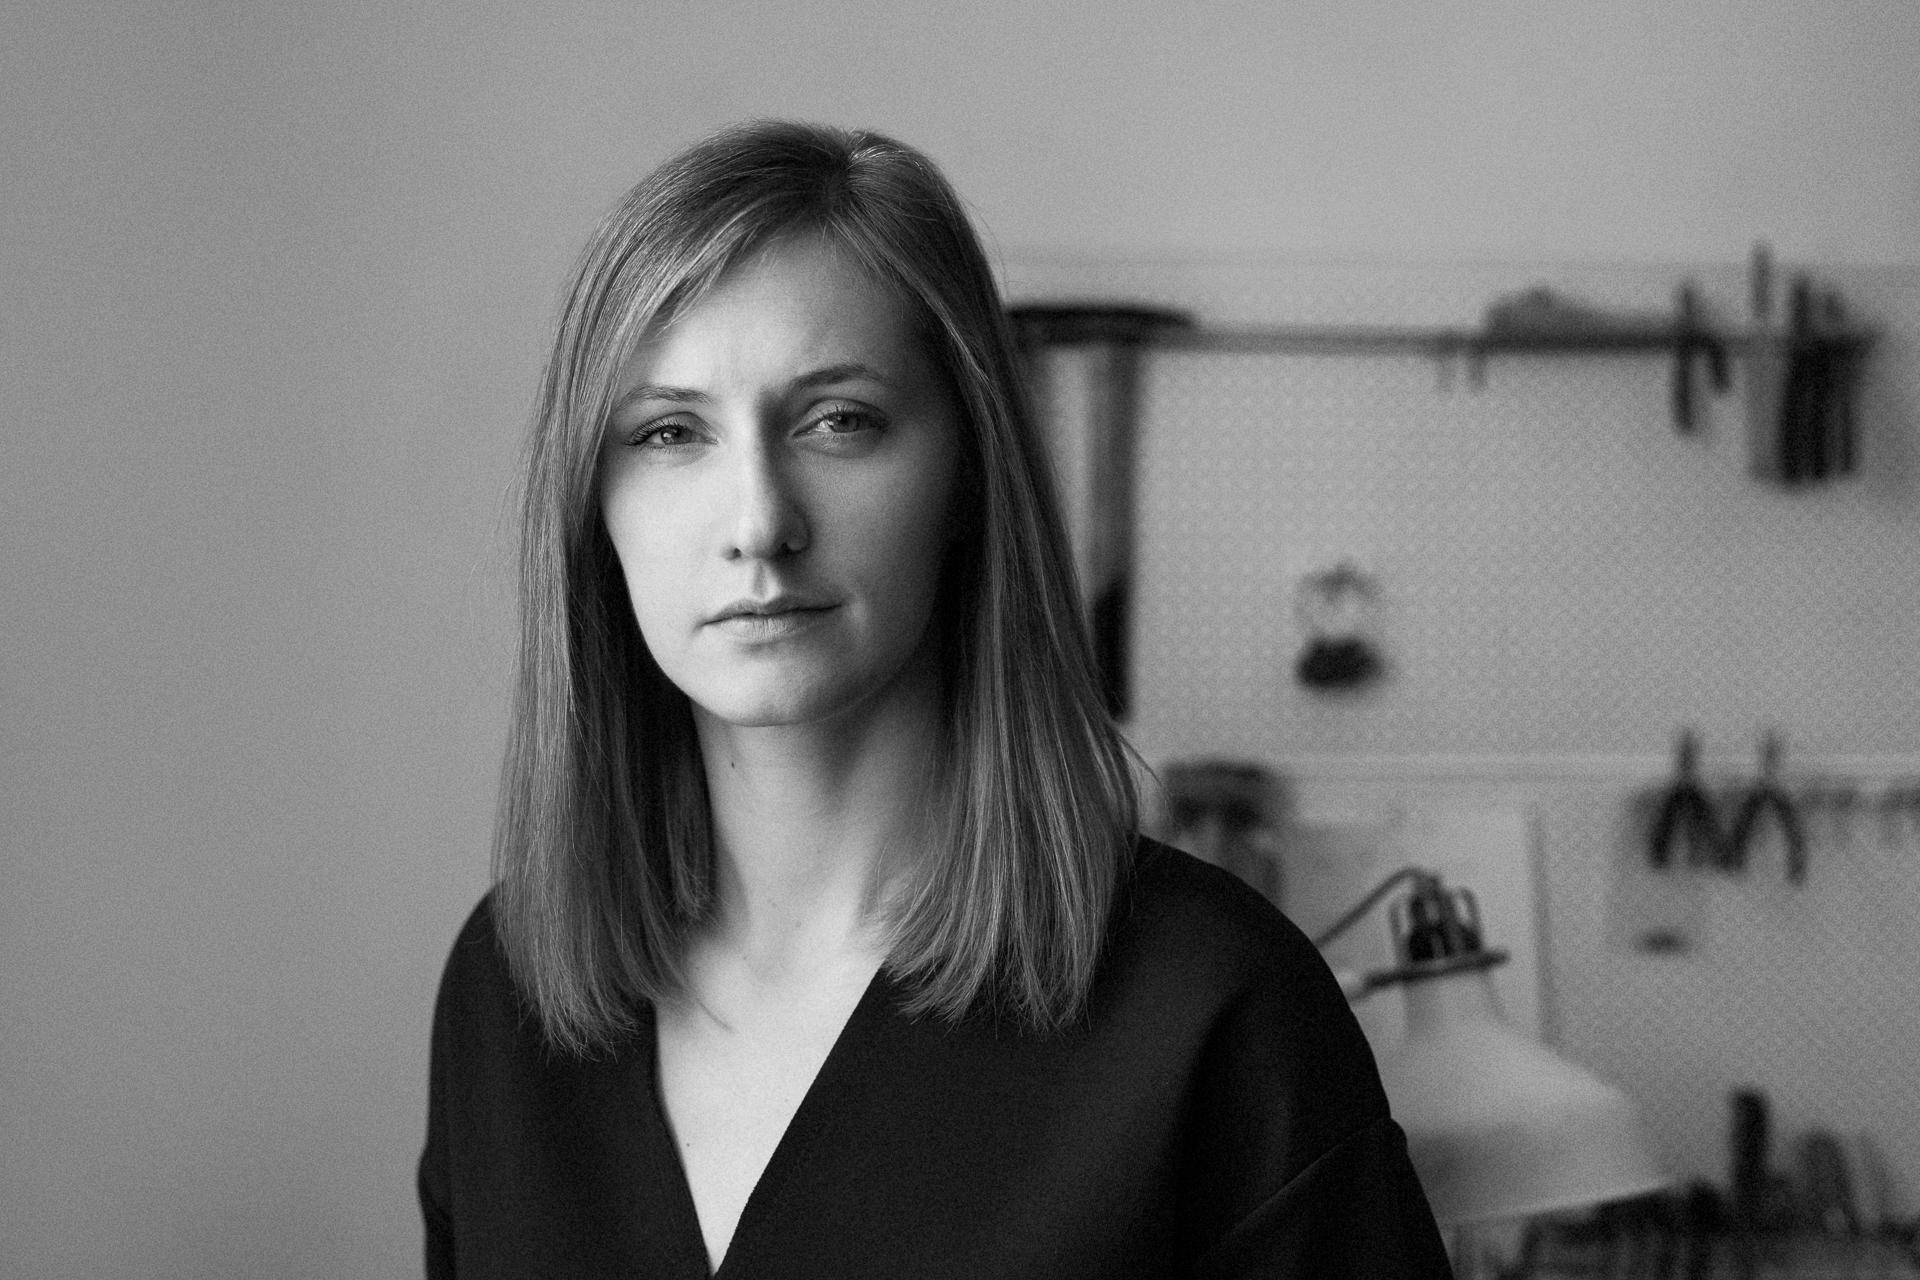 Rasma Puspure: Ethical Jewellery Designer #Savant - Photo: Arttu Karvonen